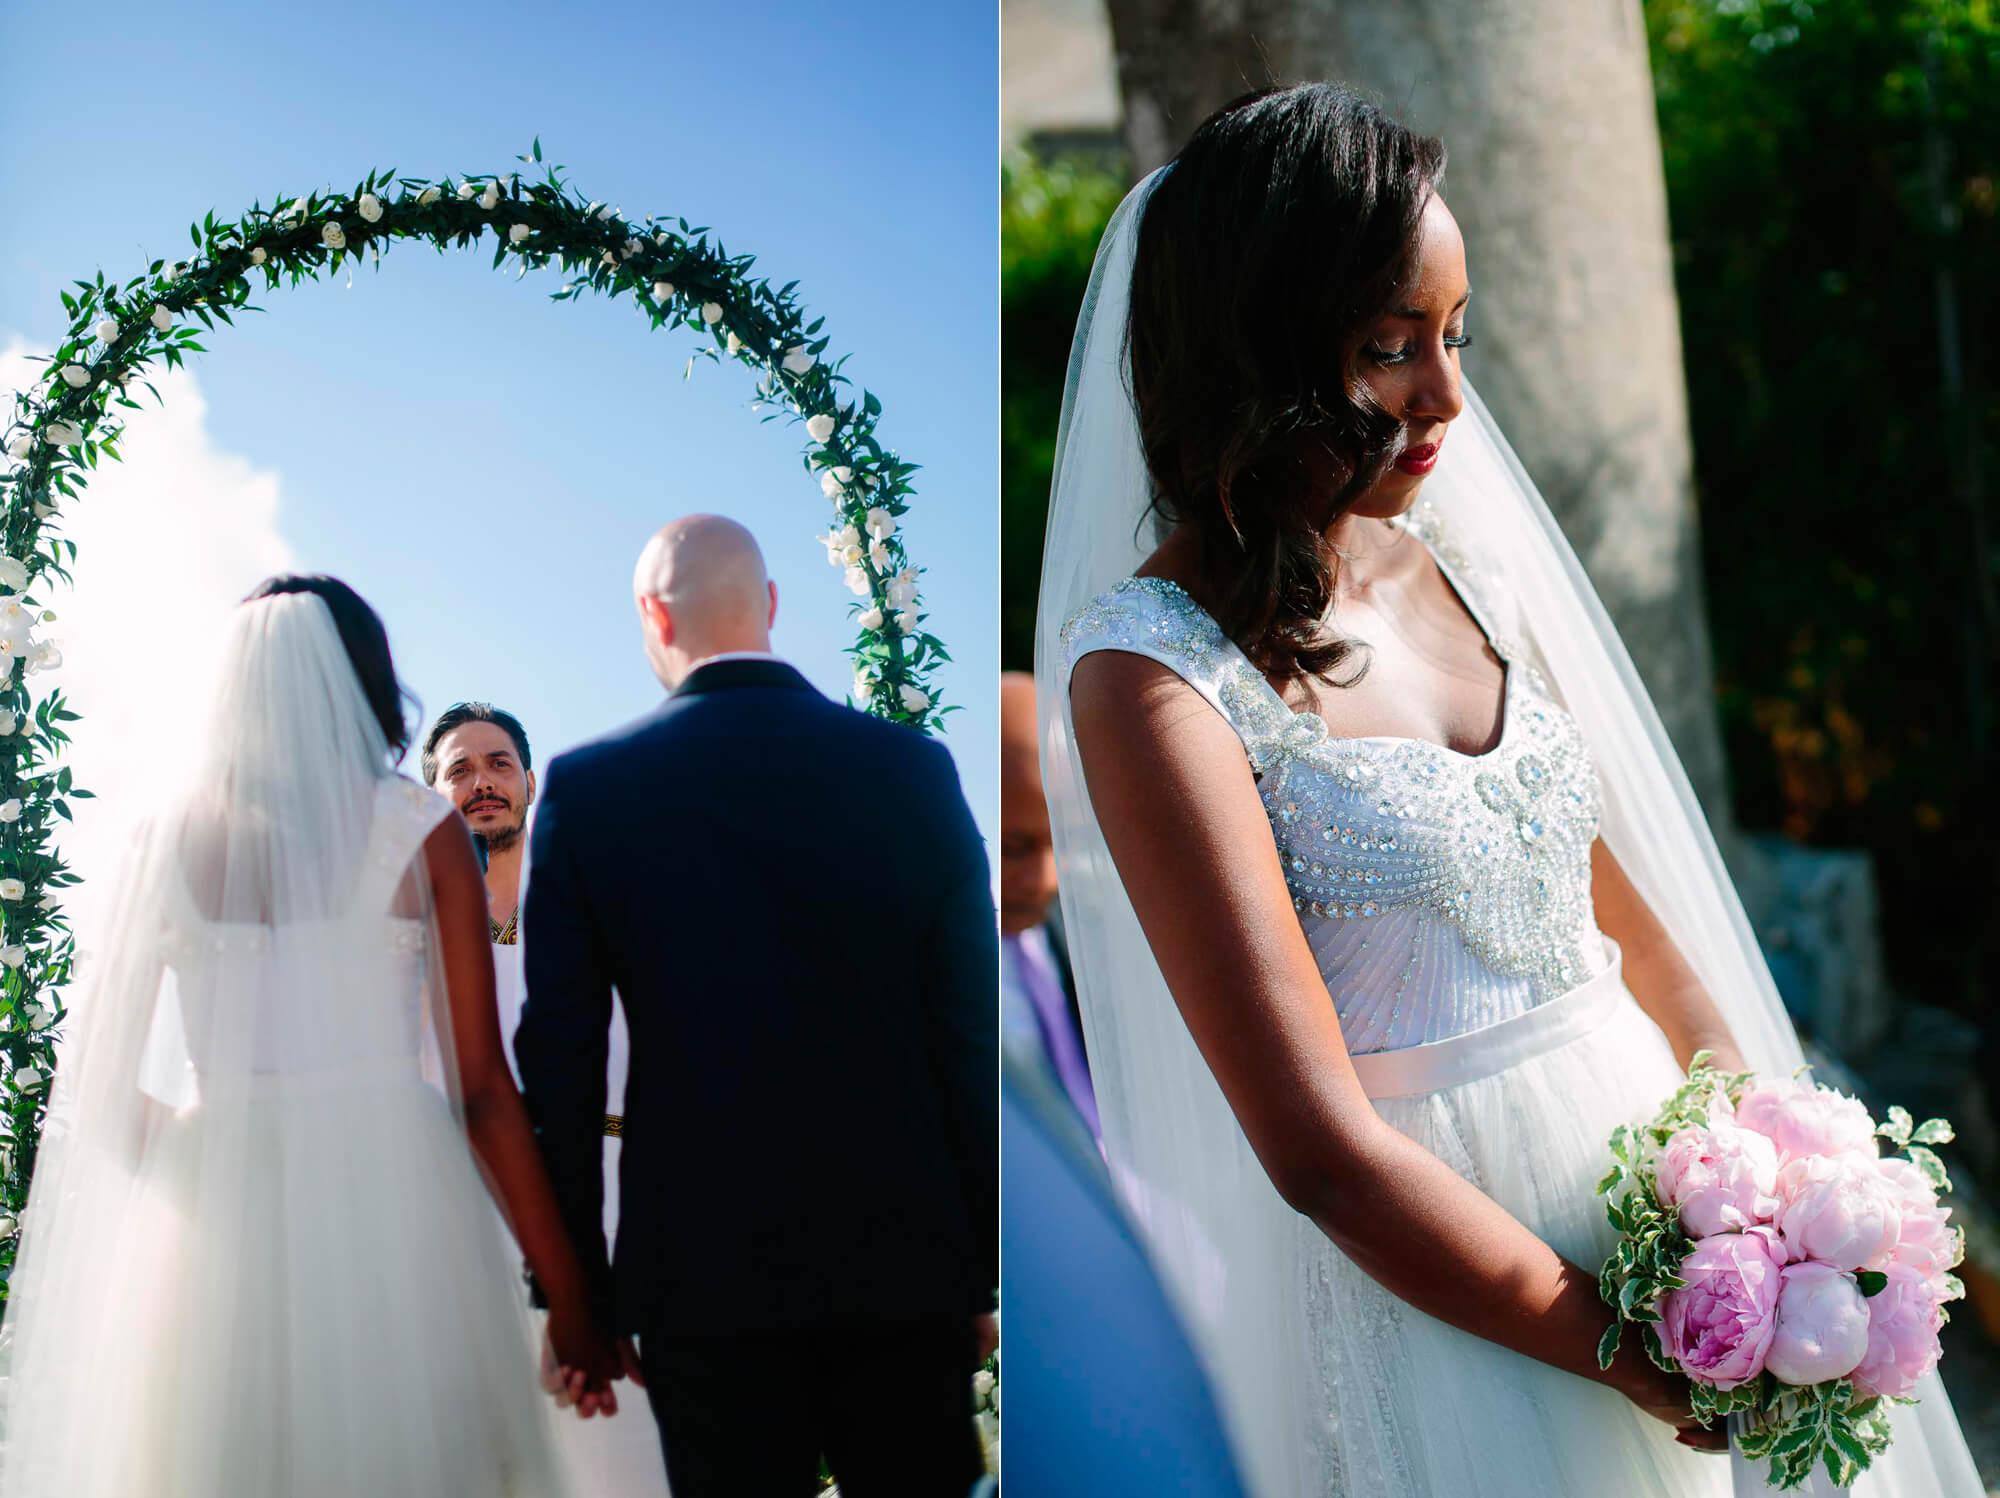 065-sorrento-wedding-photographer.jpg